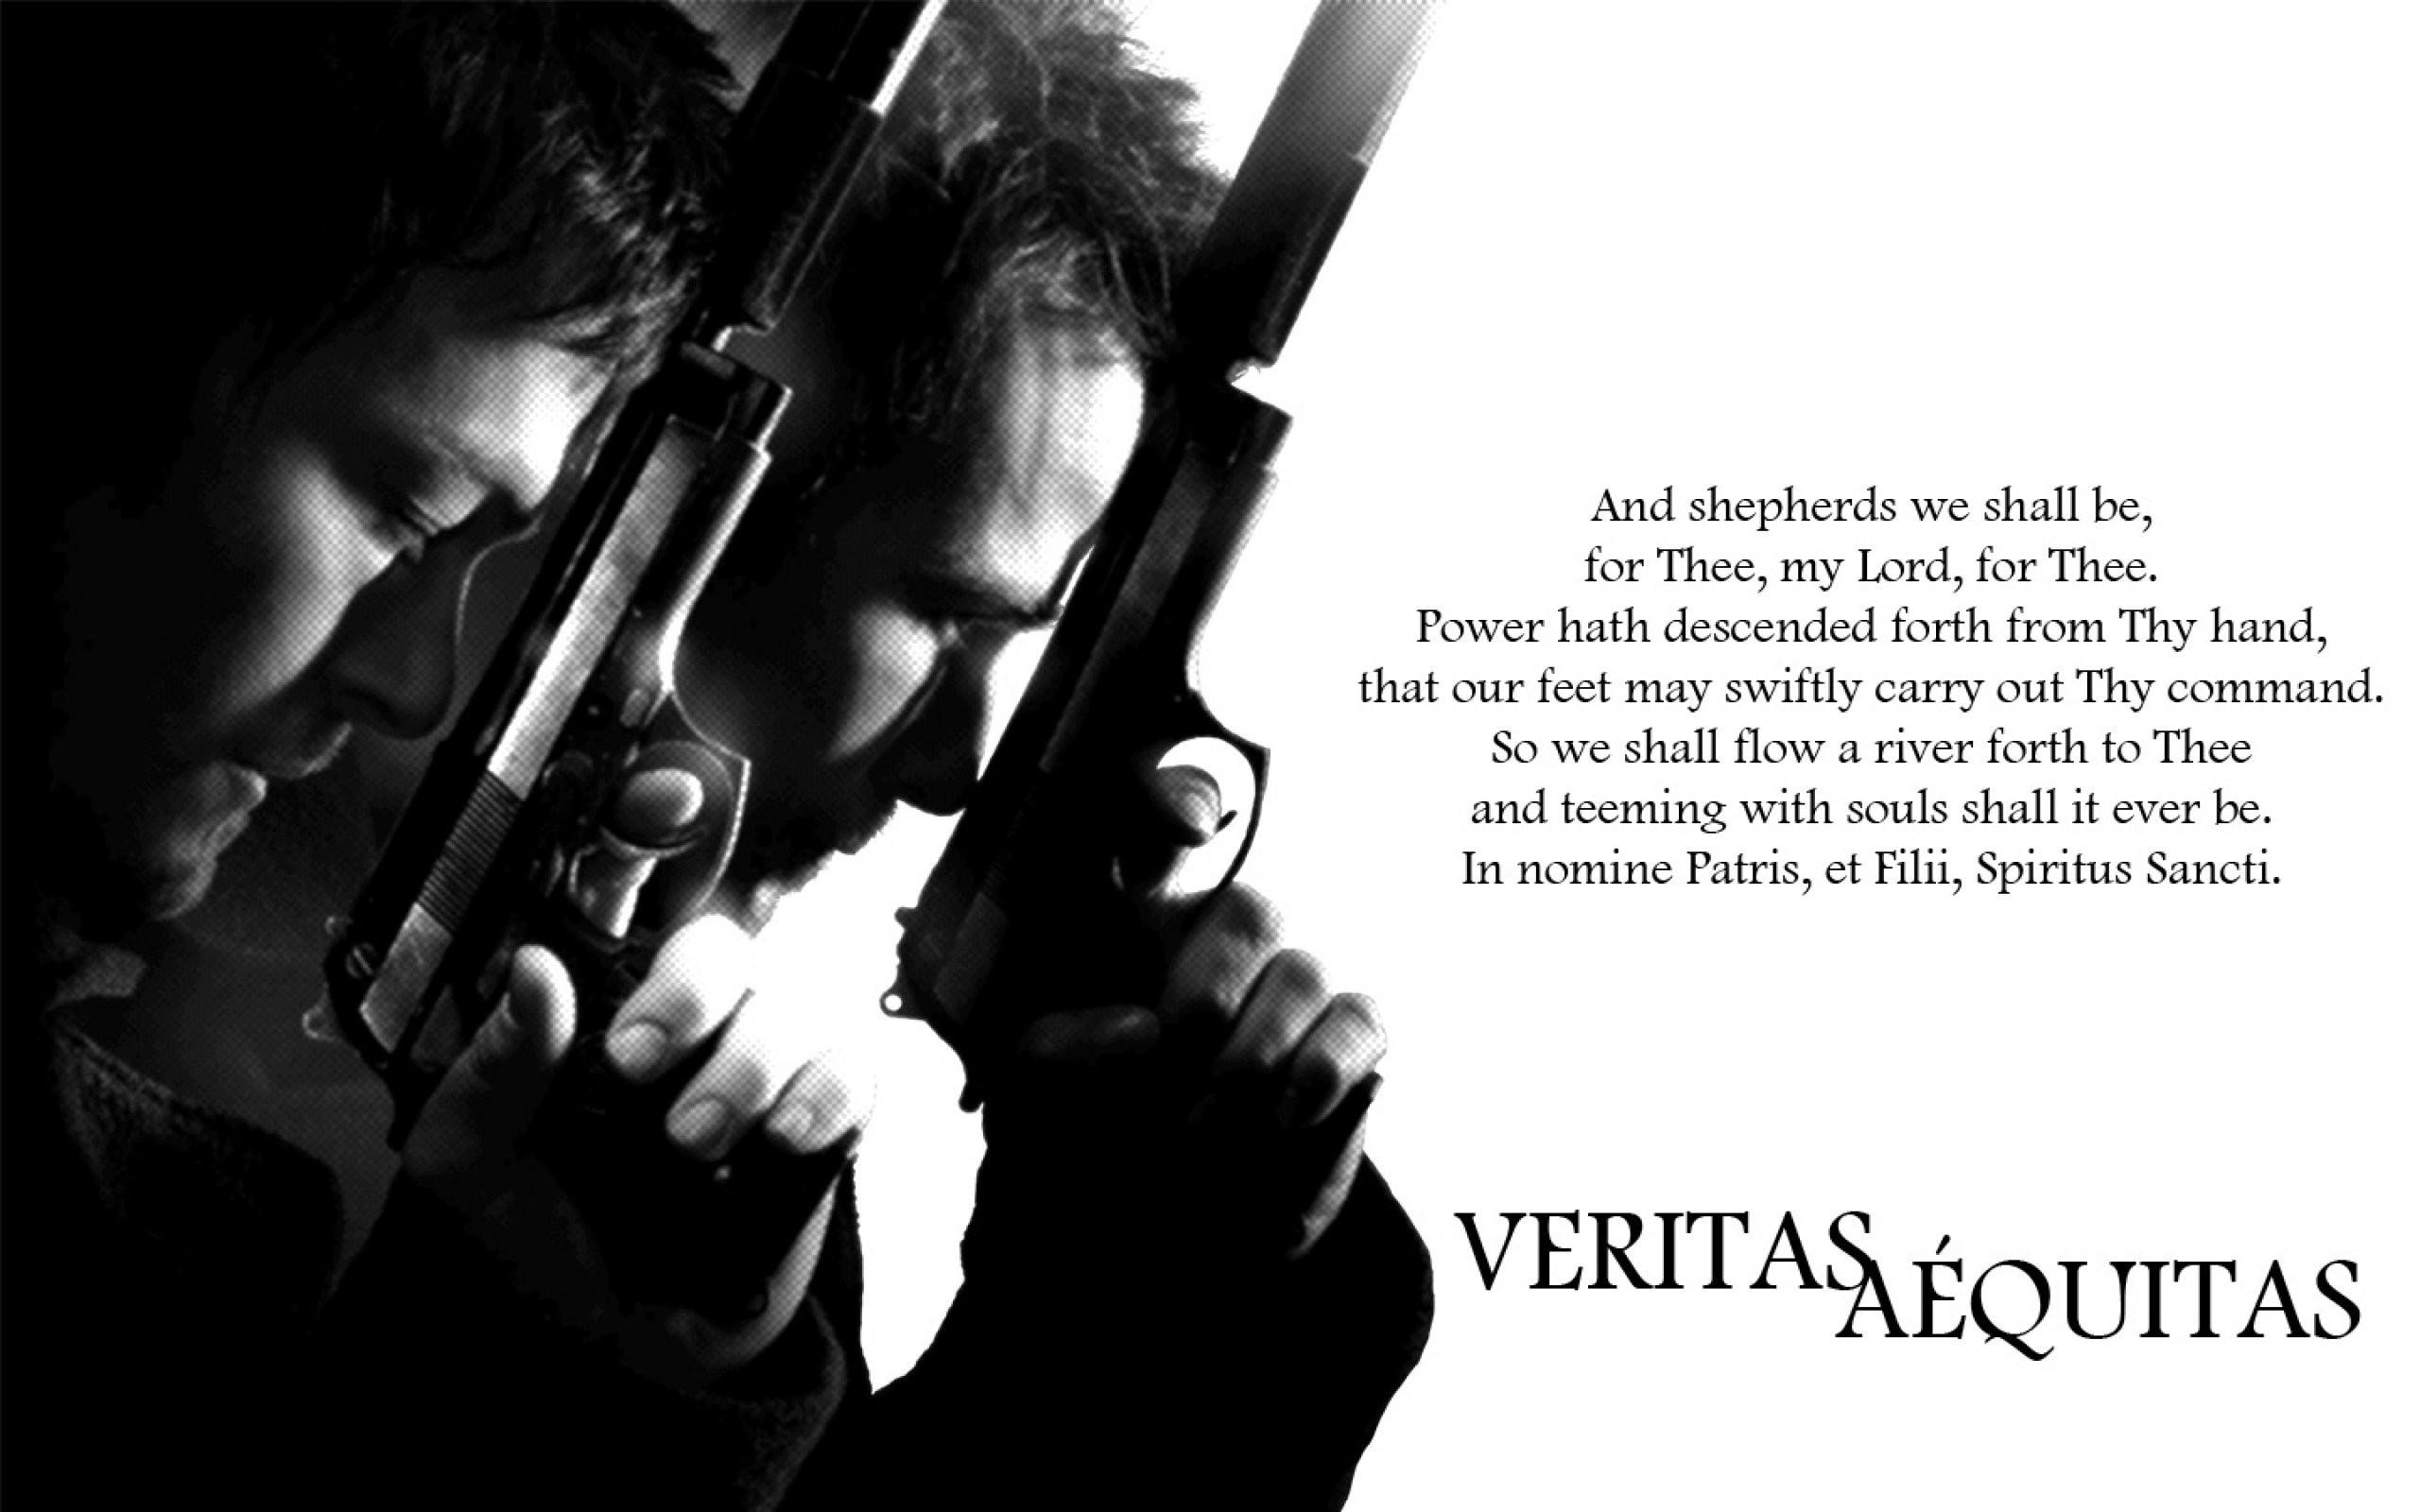 BOONDOCK SAINTS action crime thriller weapon gun pistol wallpaper      499668   WallpaperUP